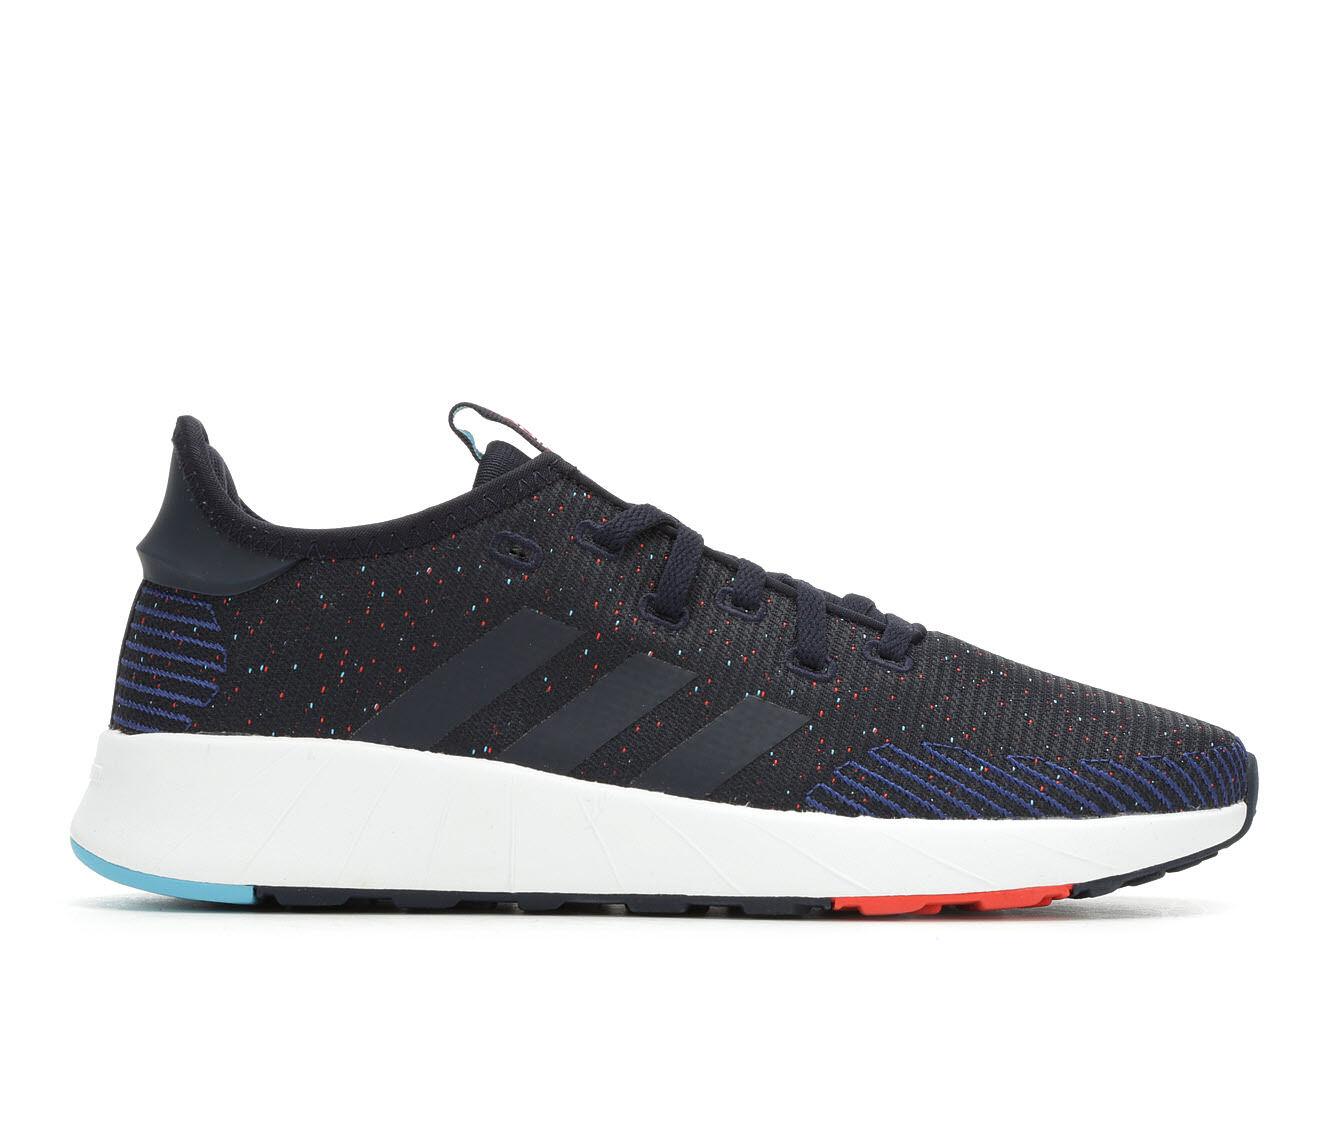 Women's Adidas Questar X Sneakers Ink/Navy/Wht